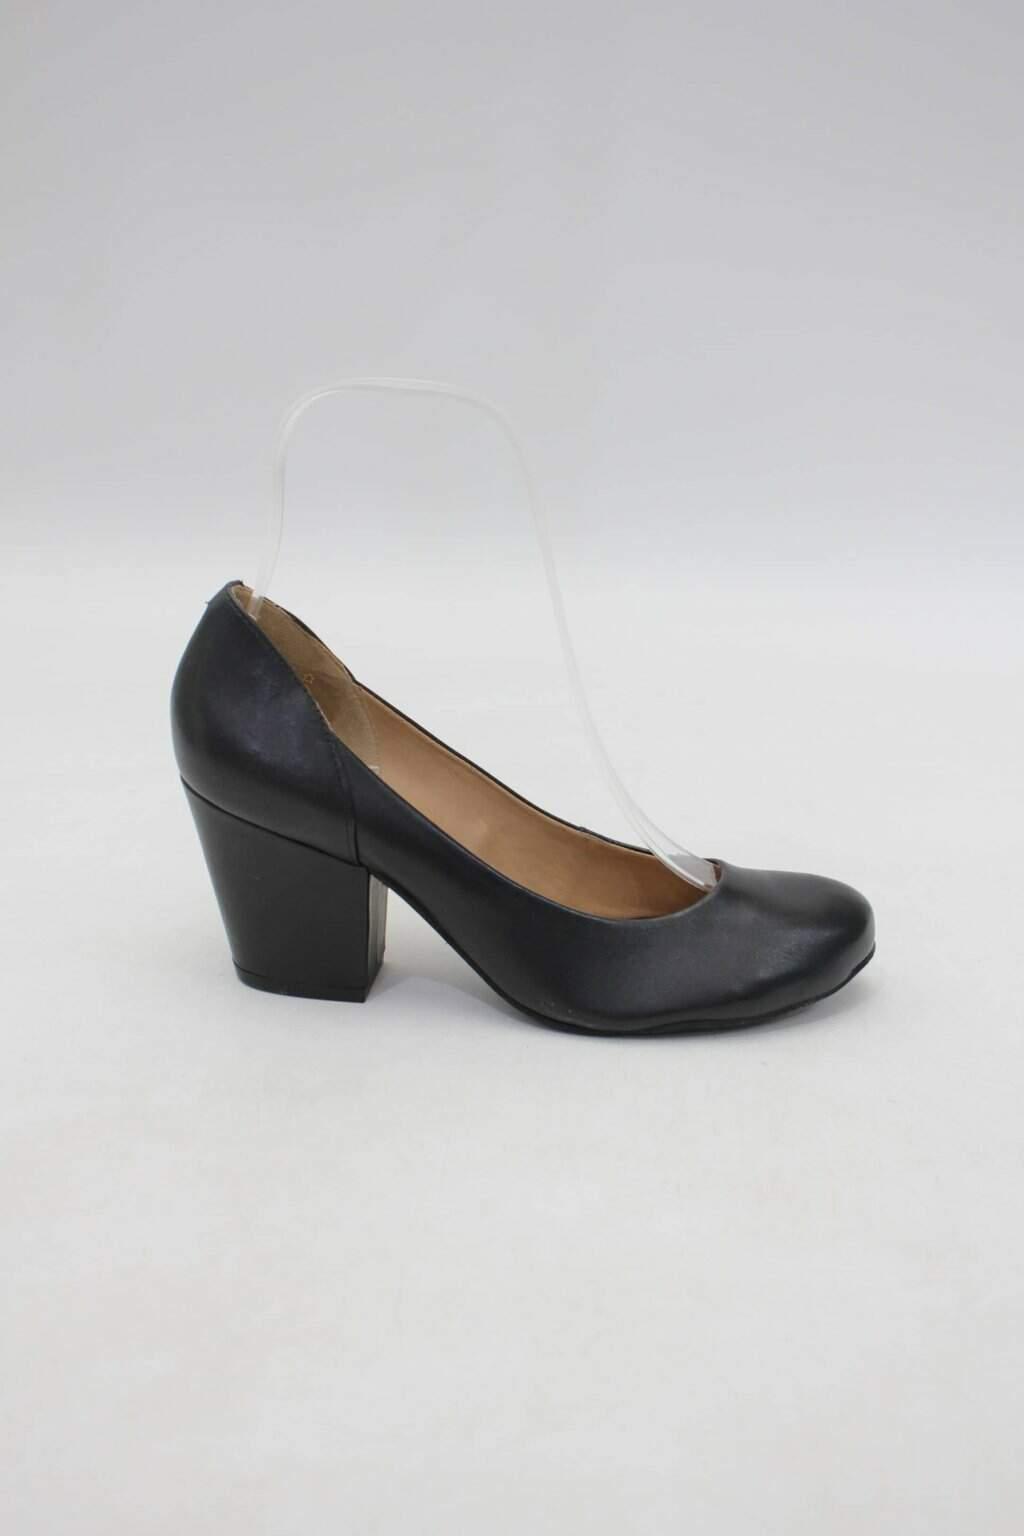 Sapato ateliermix feminino preto